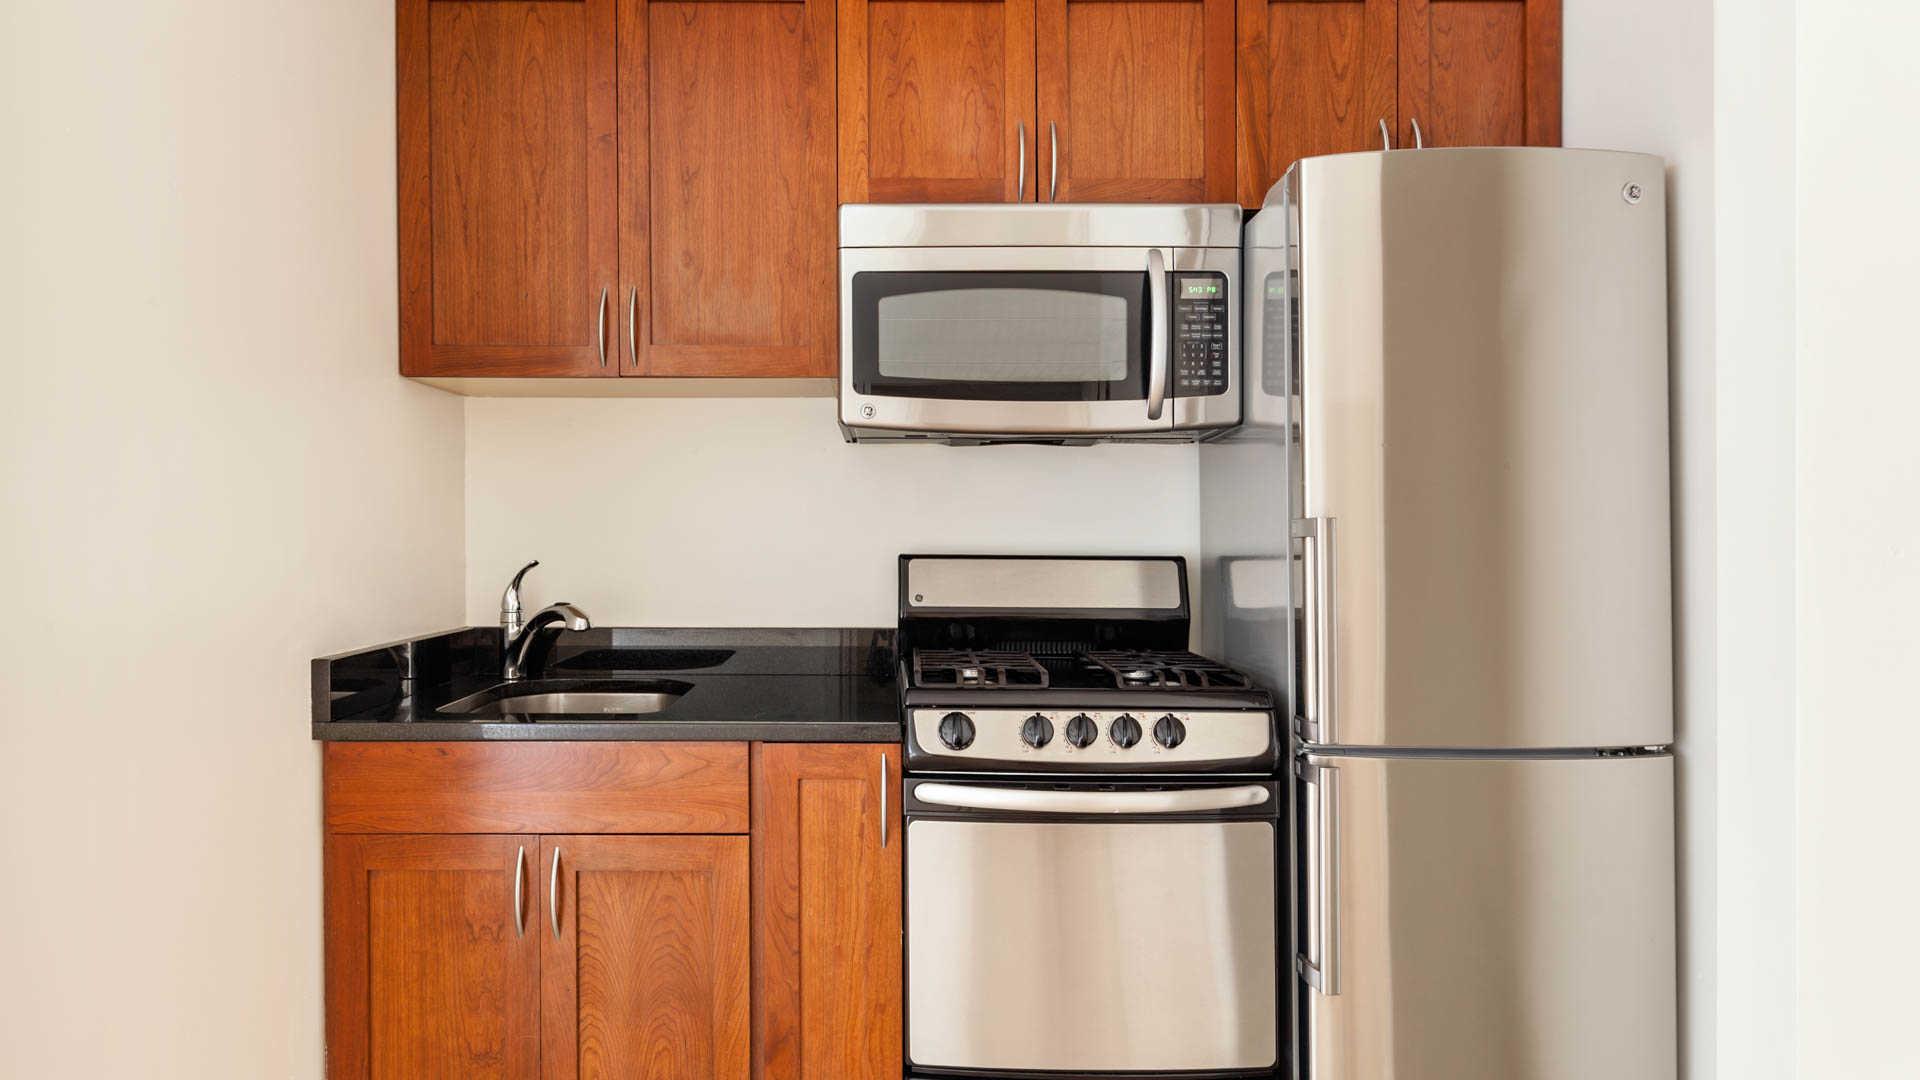 New york studio at west 71st street 2175 apartable for Studio apartment kitchen appliances